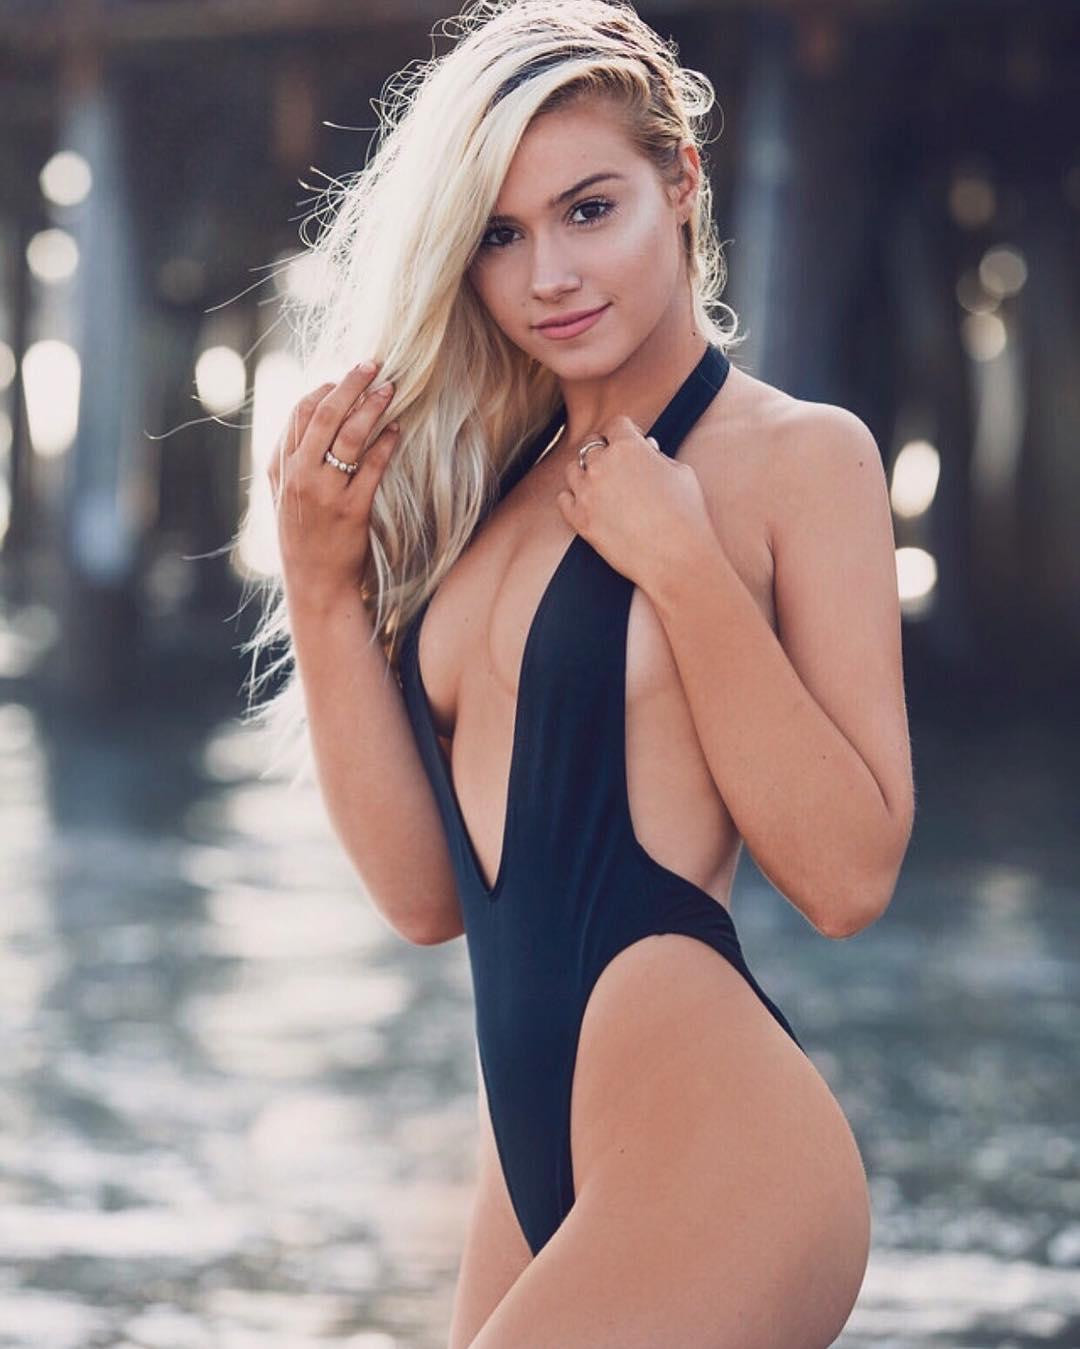 Hot Kayla Shea naked (28 foto and video), Topless, Bikini, Feet, braless 2006